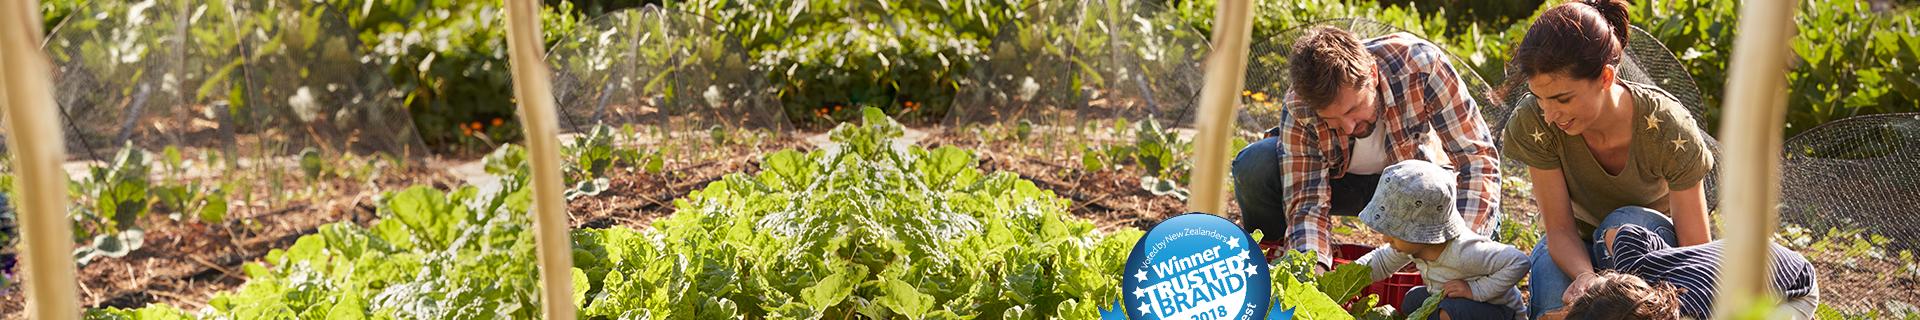 Family picking lettuce in a small farm. Winner trusted brand 2018 logo.